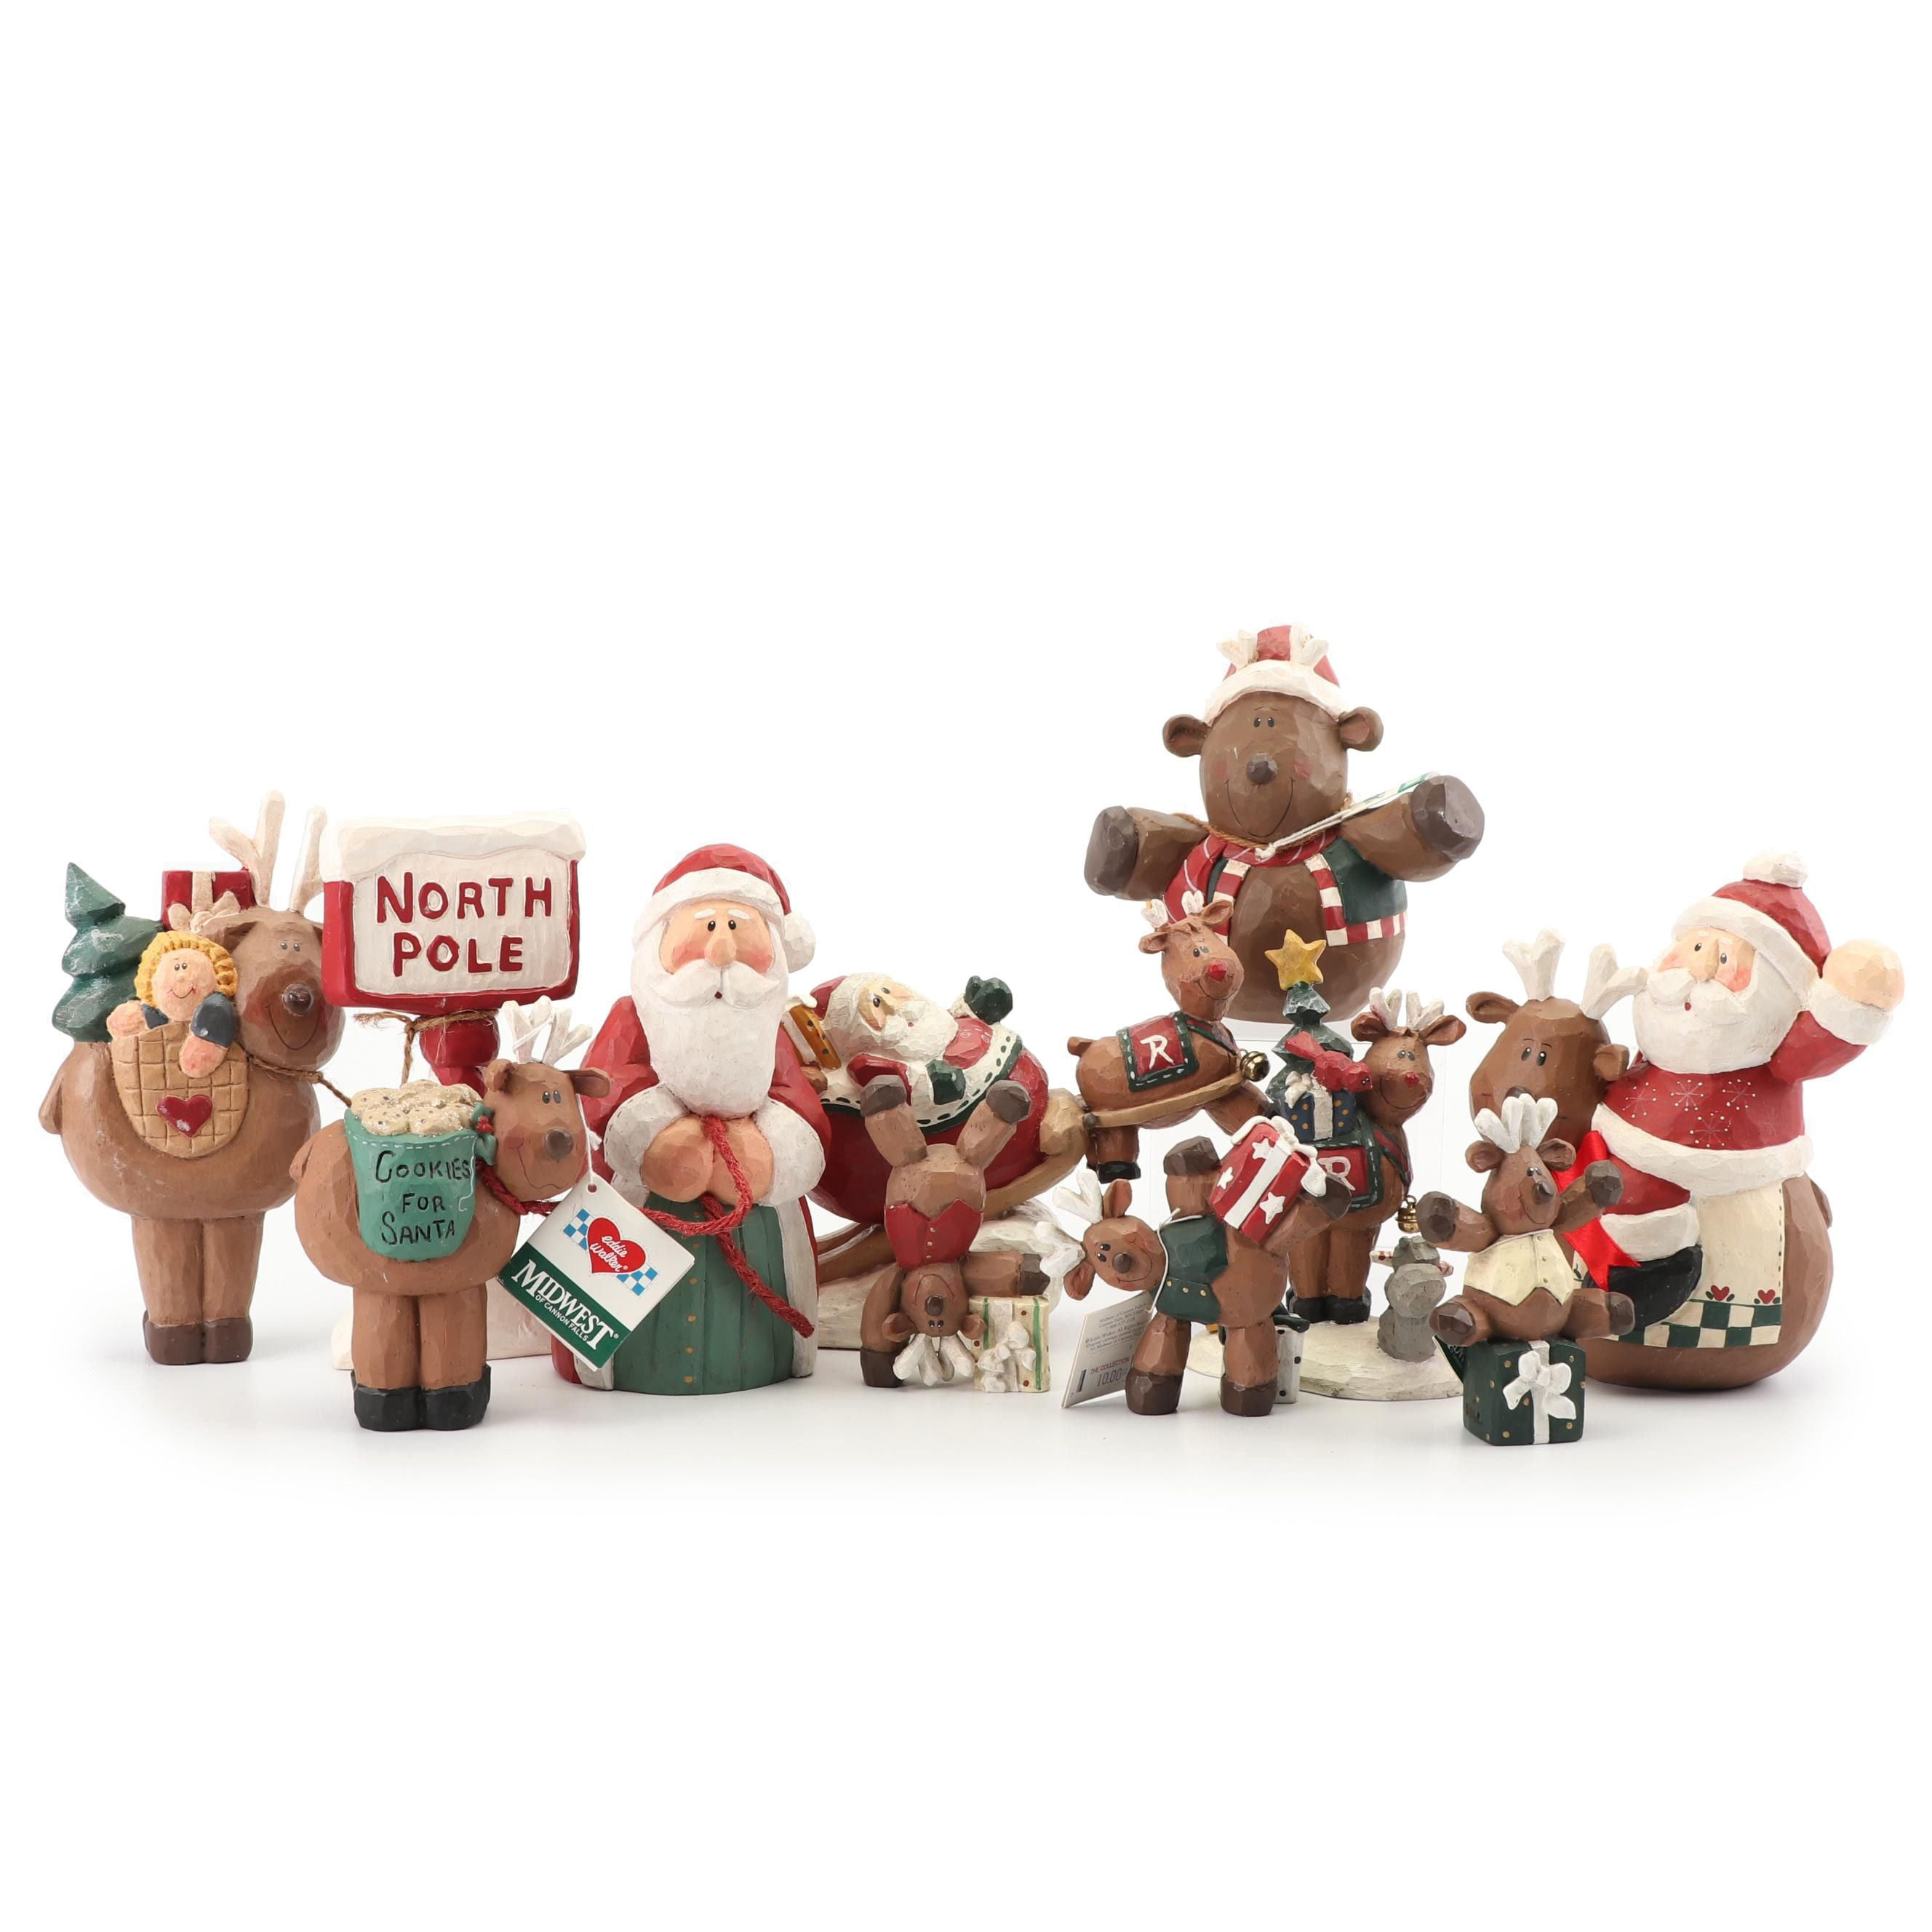 Reindeer Themed Christmas Decor